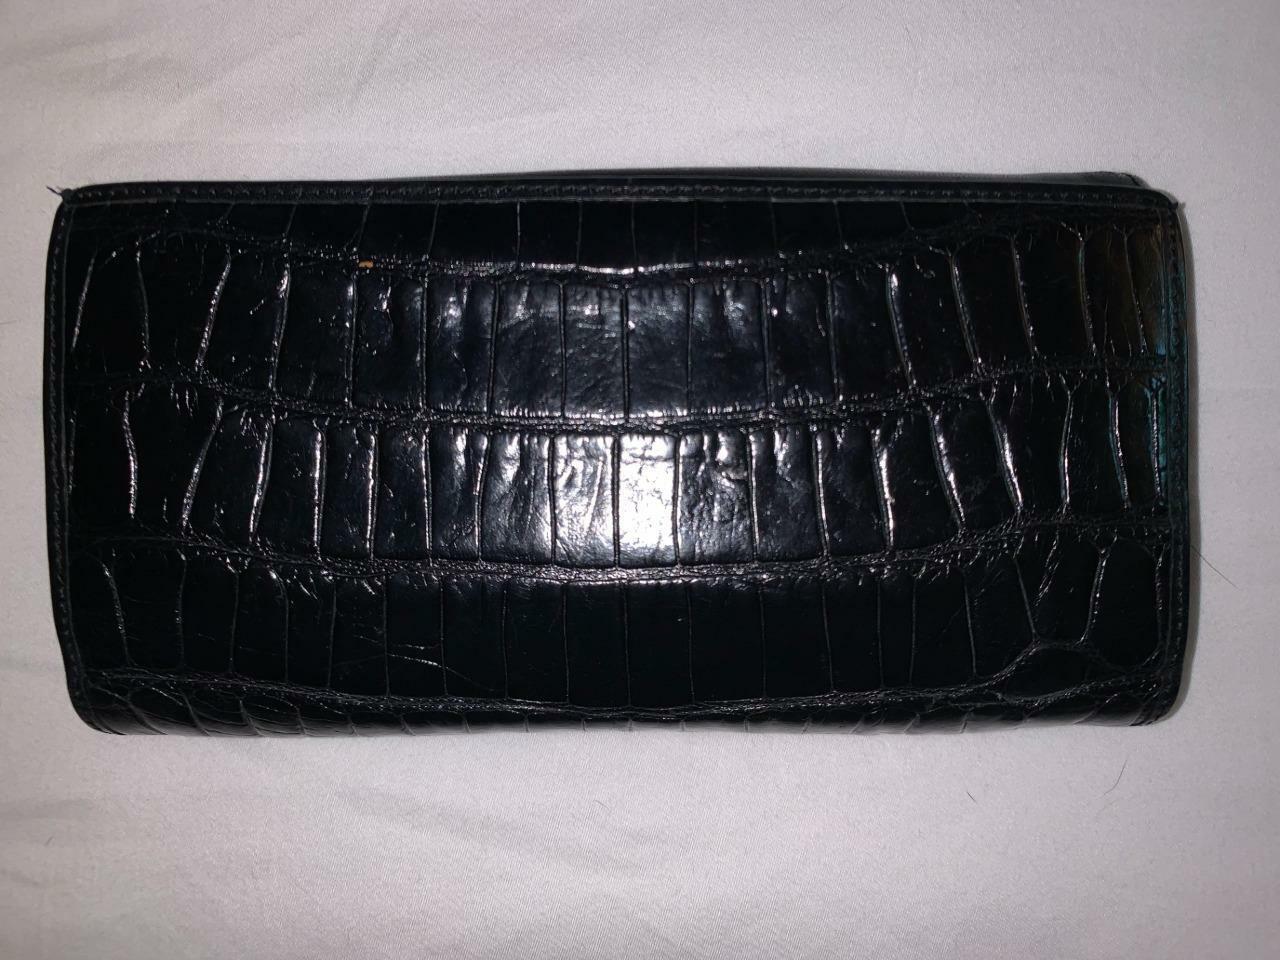 Paradox Women's Vintage Faux Alligator/Croc Black Leather Bi-Fold Wallet Clutch